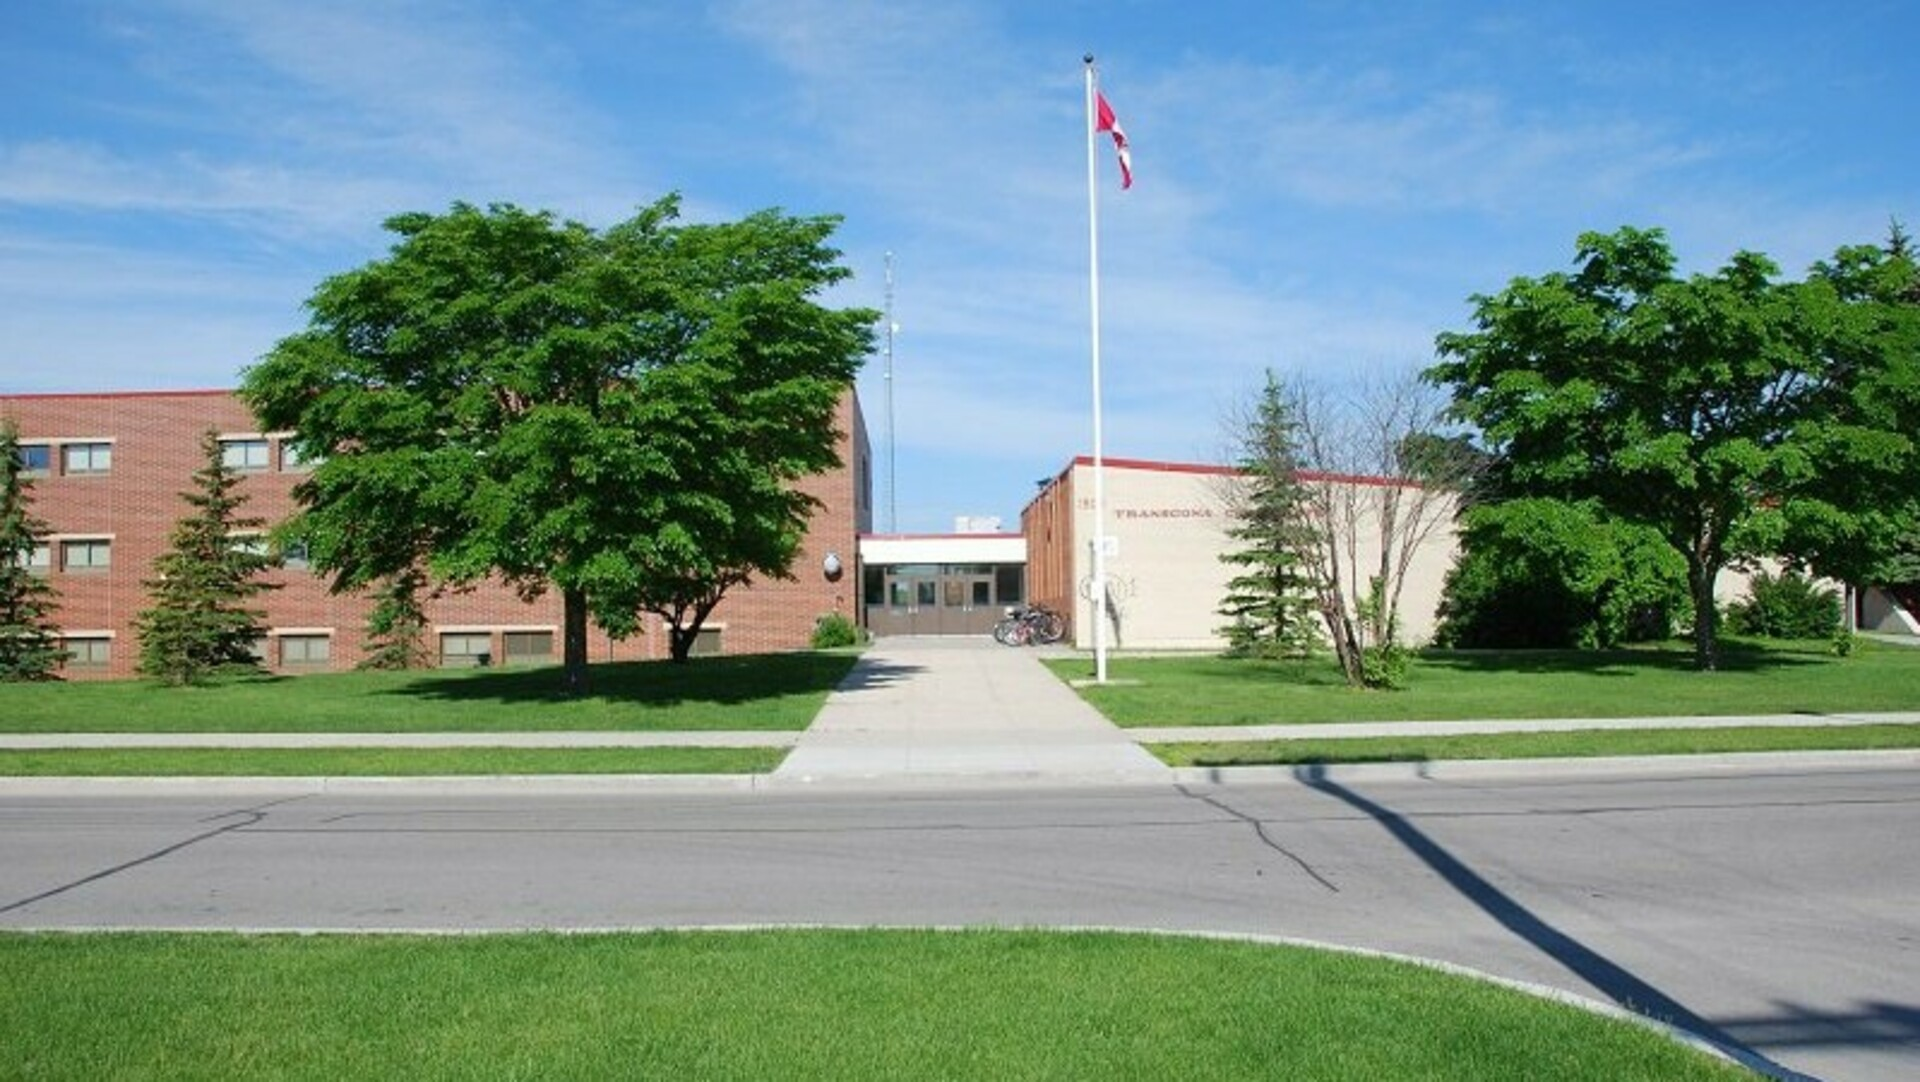 Schüleraustausch Kanada Schuldistrikte River East Transcona ODI